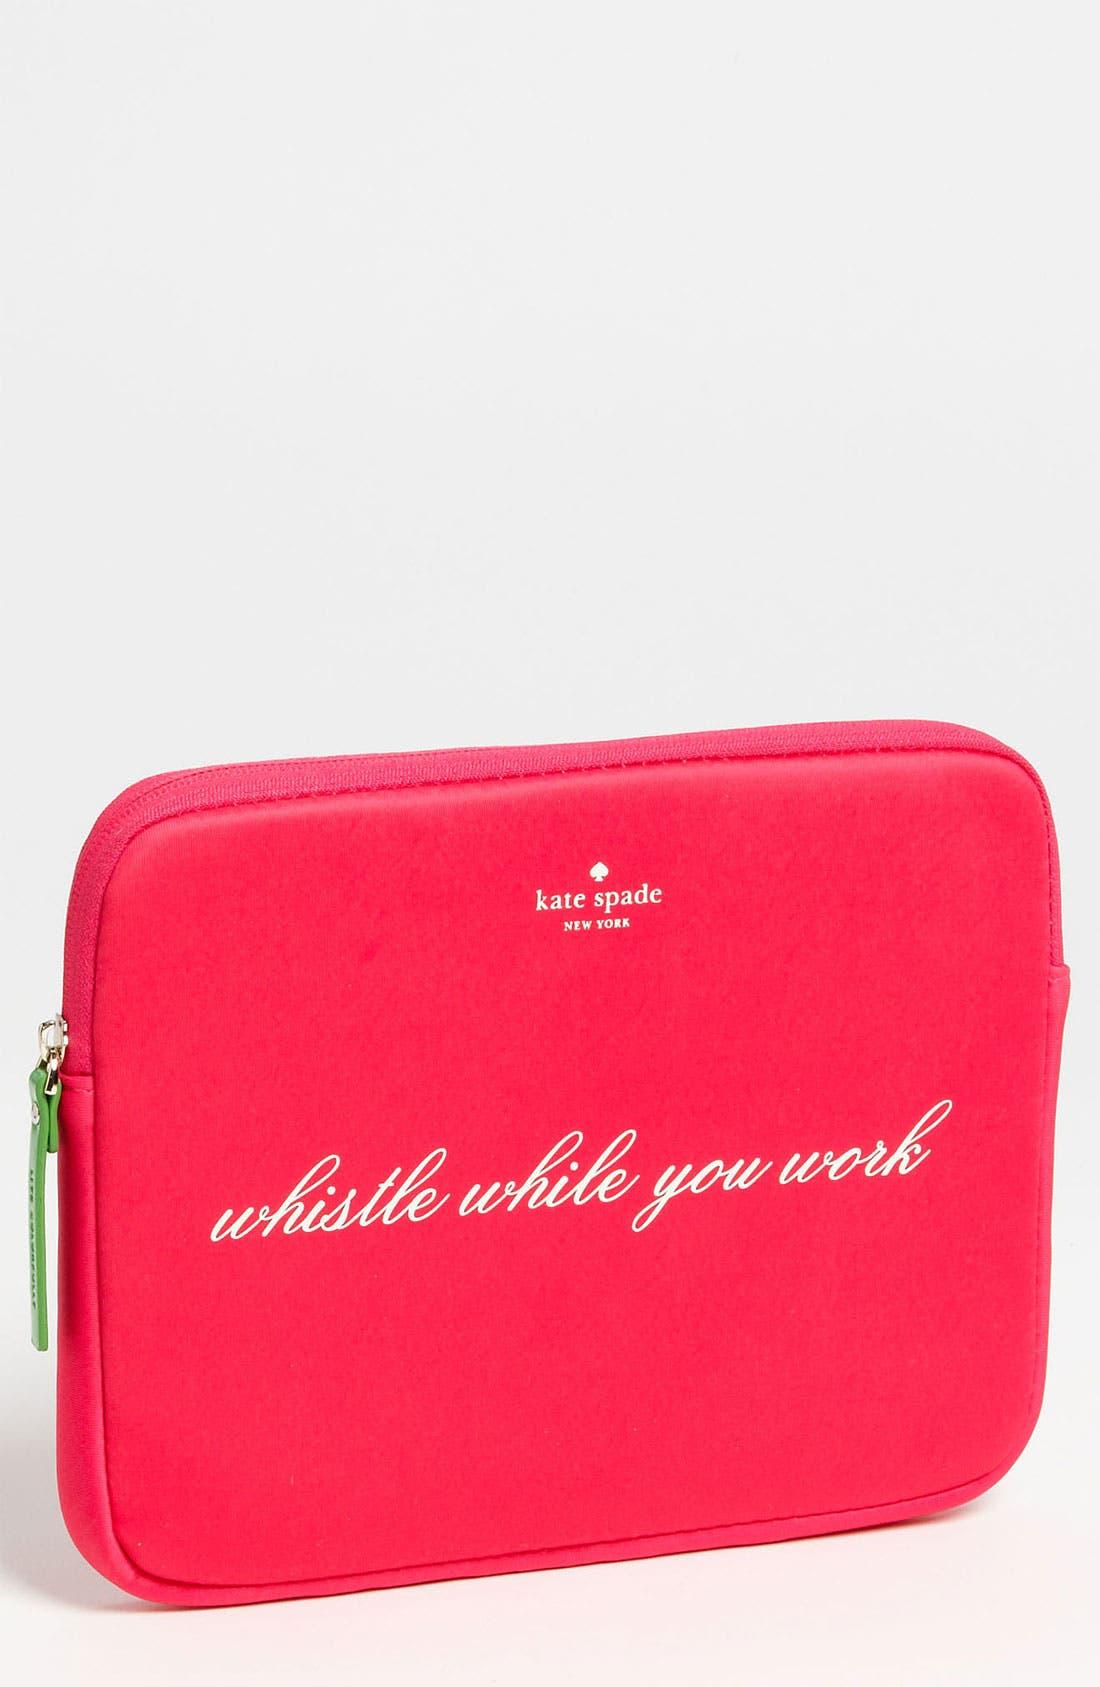 Main Image - kate spade new york 'whistle while you work' iPad sleeve